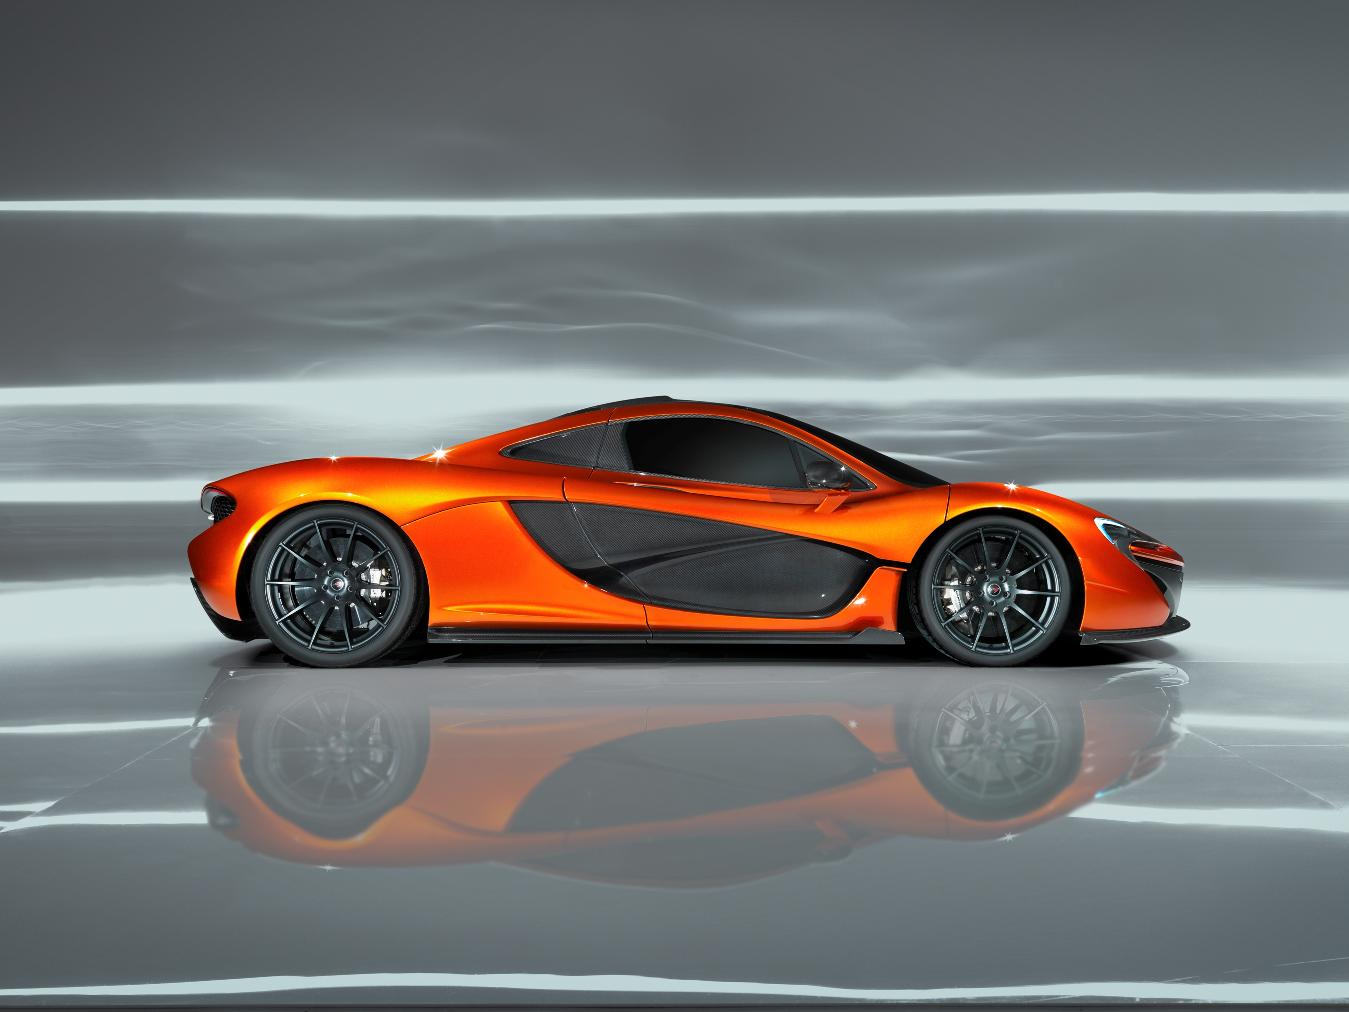 Life On Cars Mclaren Unveils New Successor To F1 Supercar